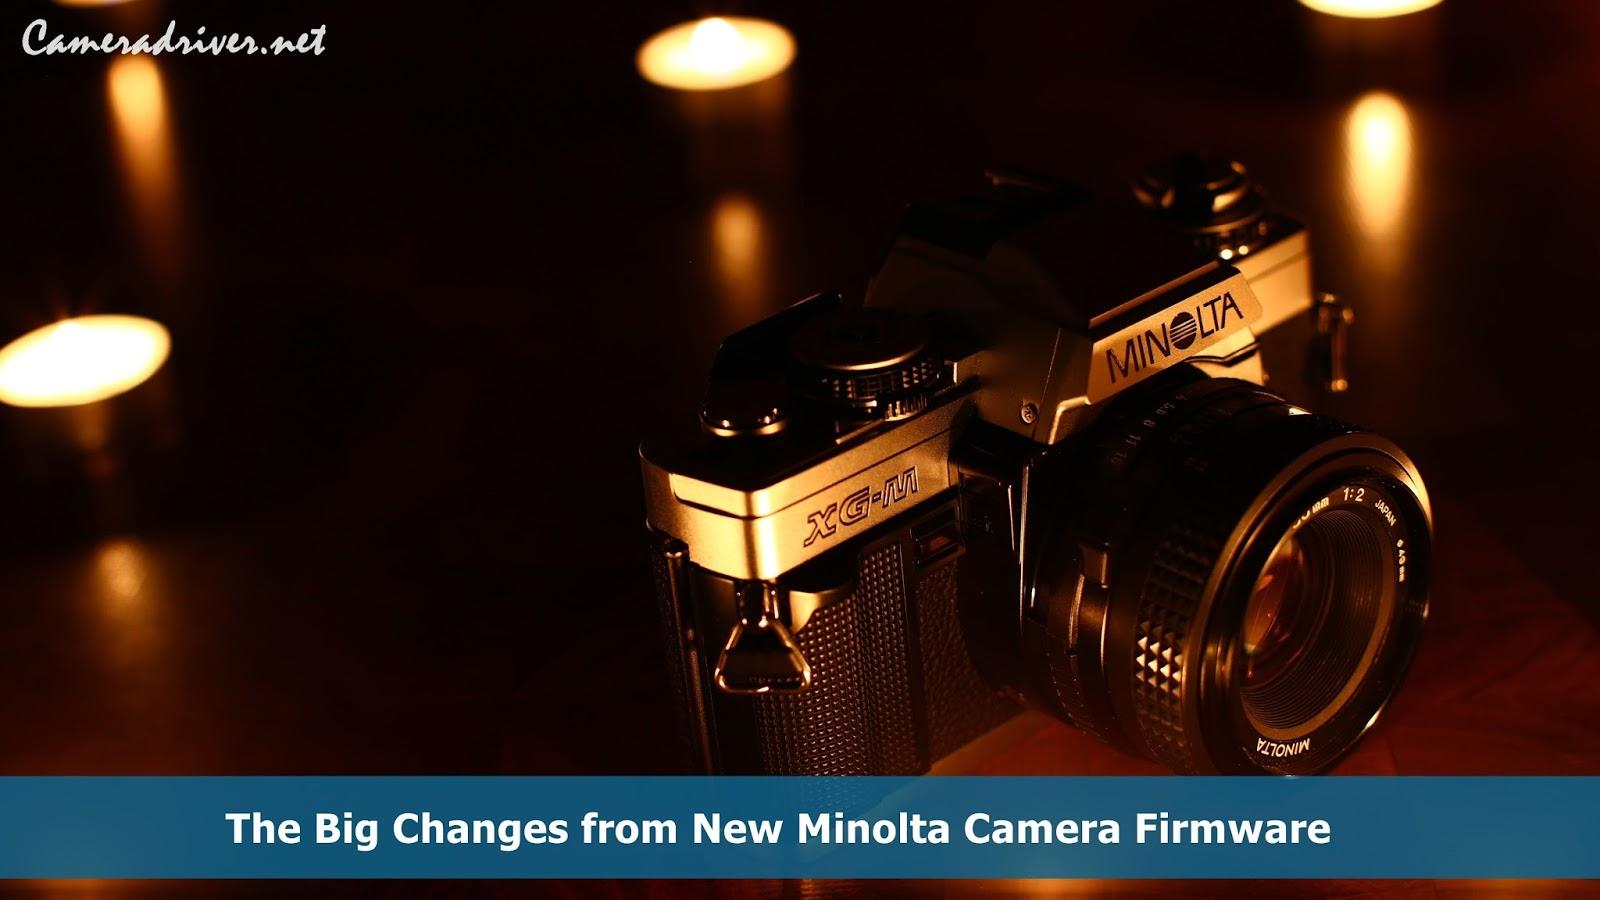 Minolta Camera Firmware